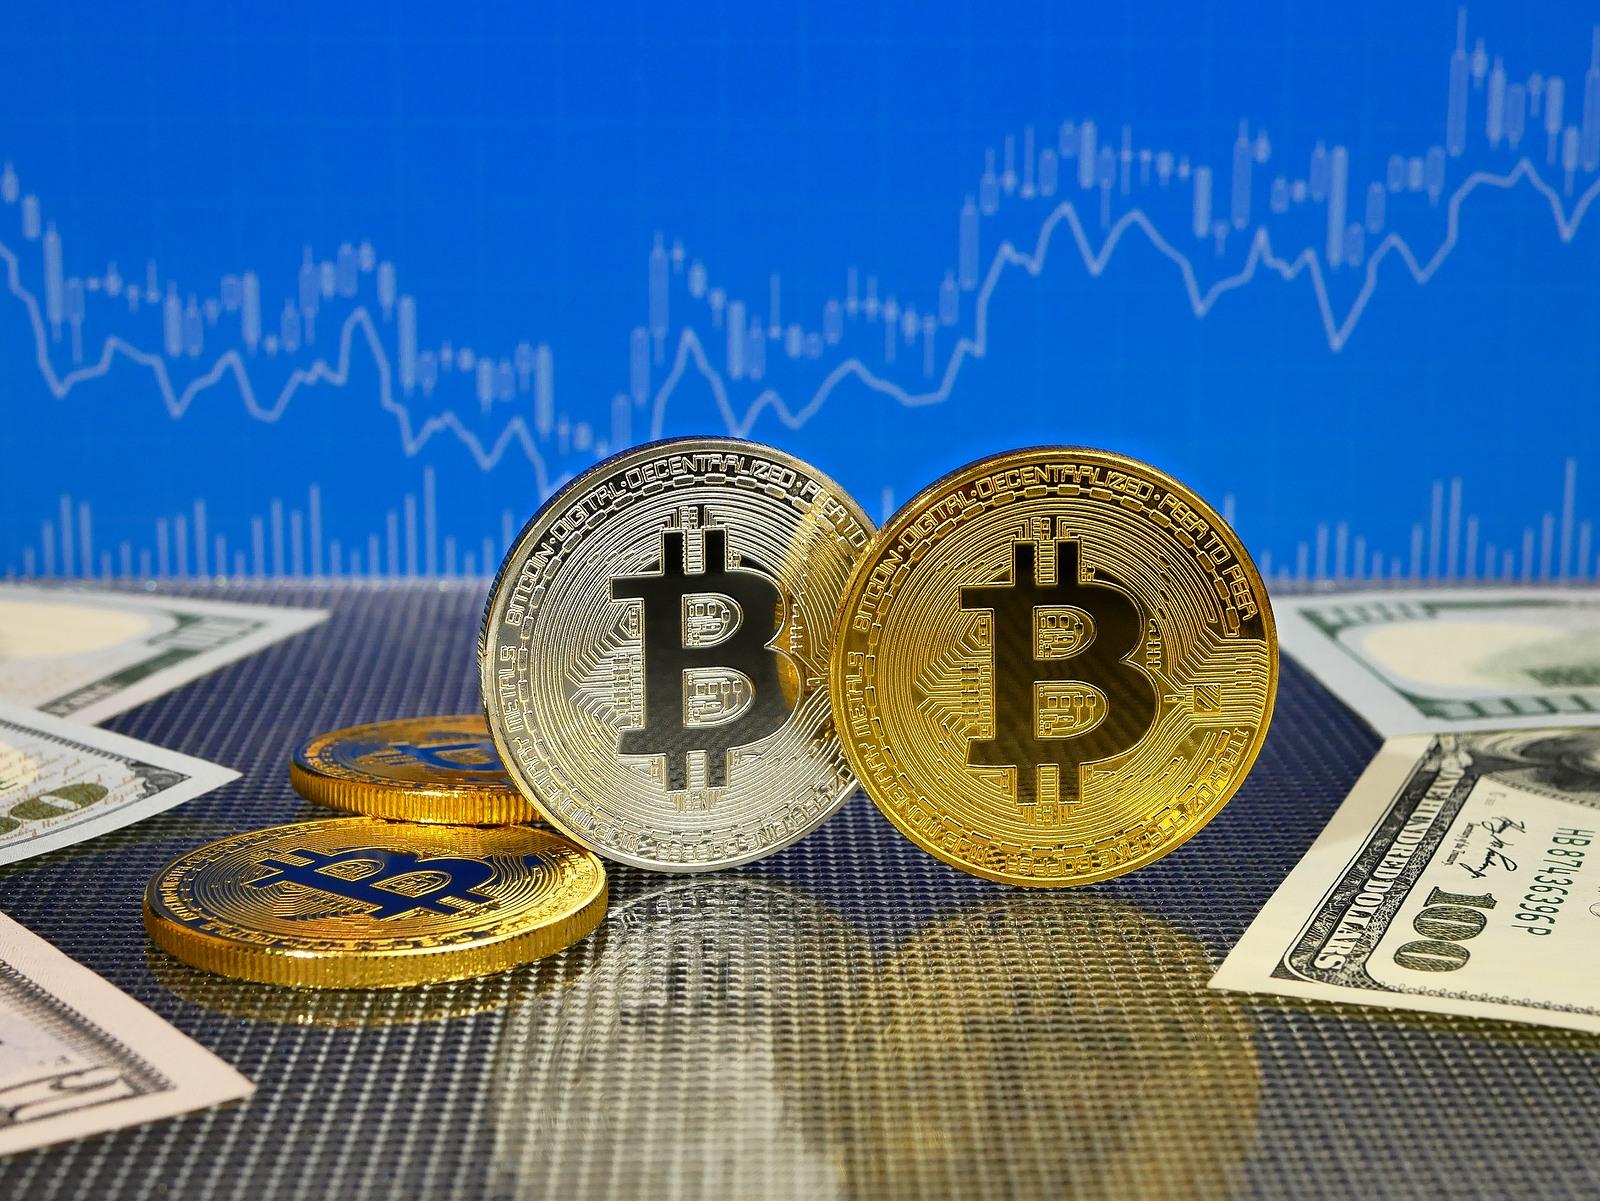 Поднимется ли биткоин до $100000?